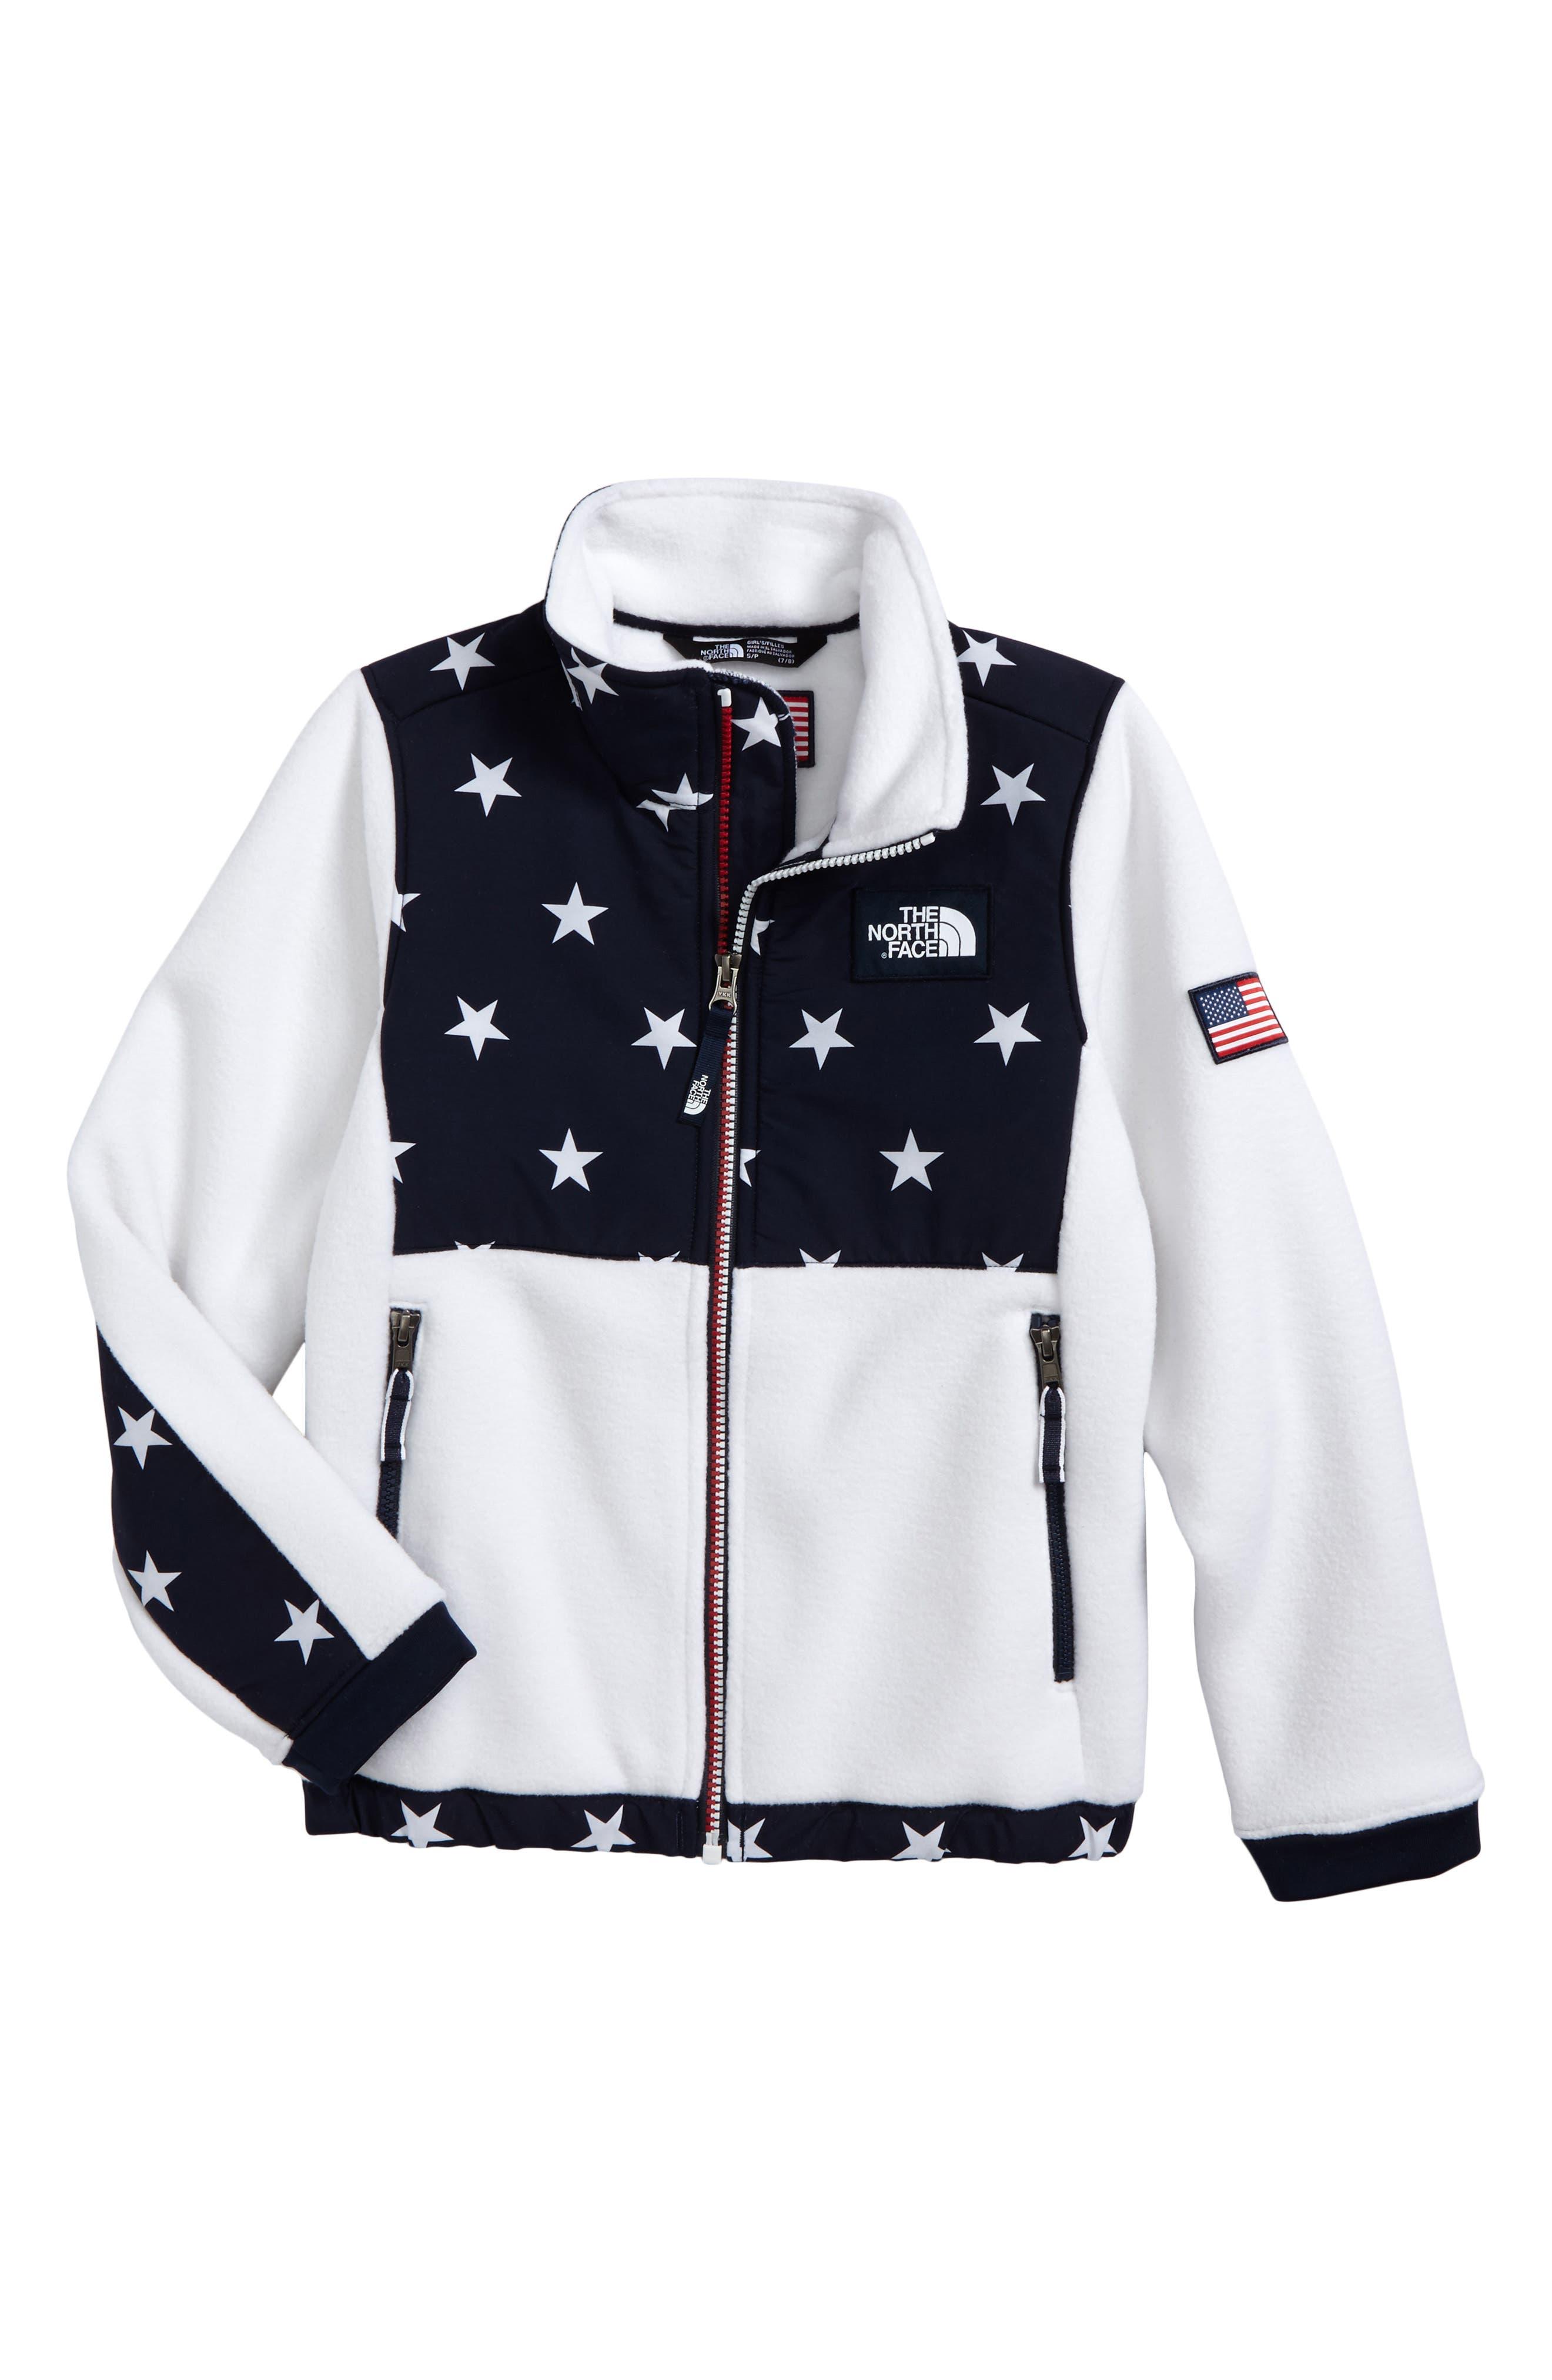 Denali Recycled Fleece Jacket,                         Main,                         color, Tnf White